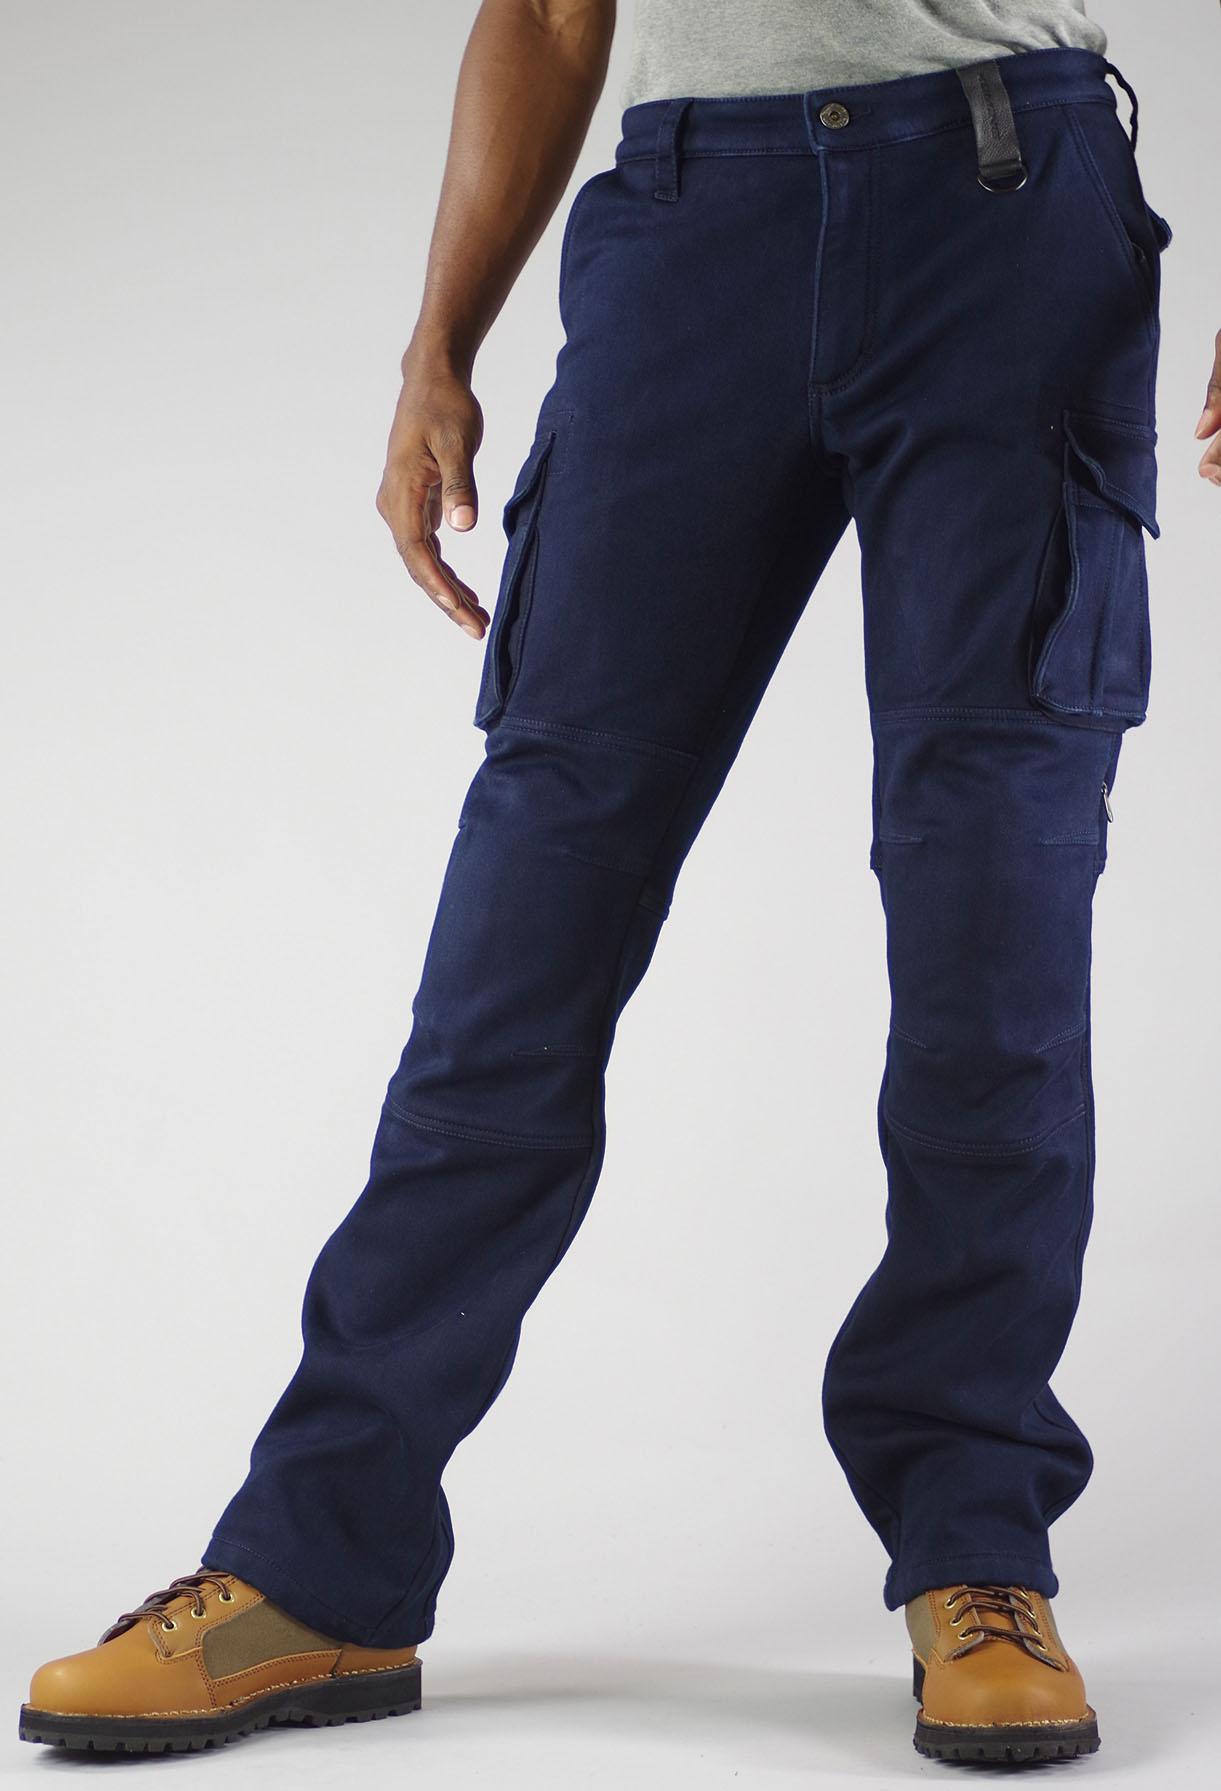 PK-919 Windproof Warm Cargo Pants